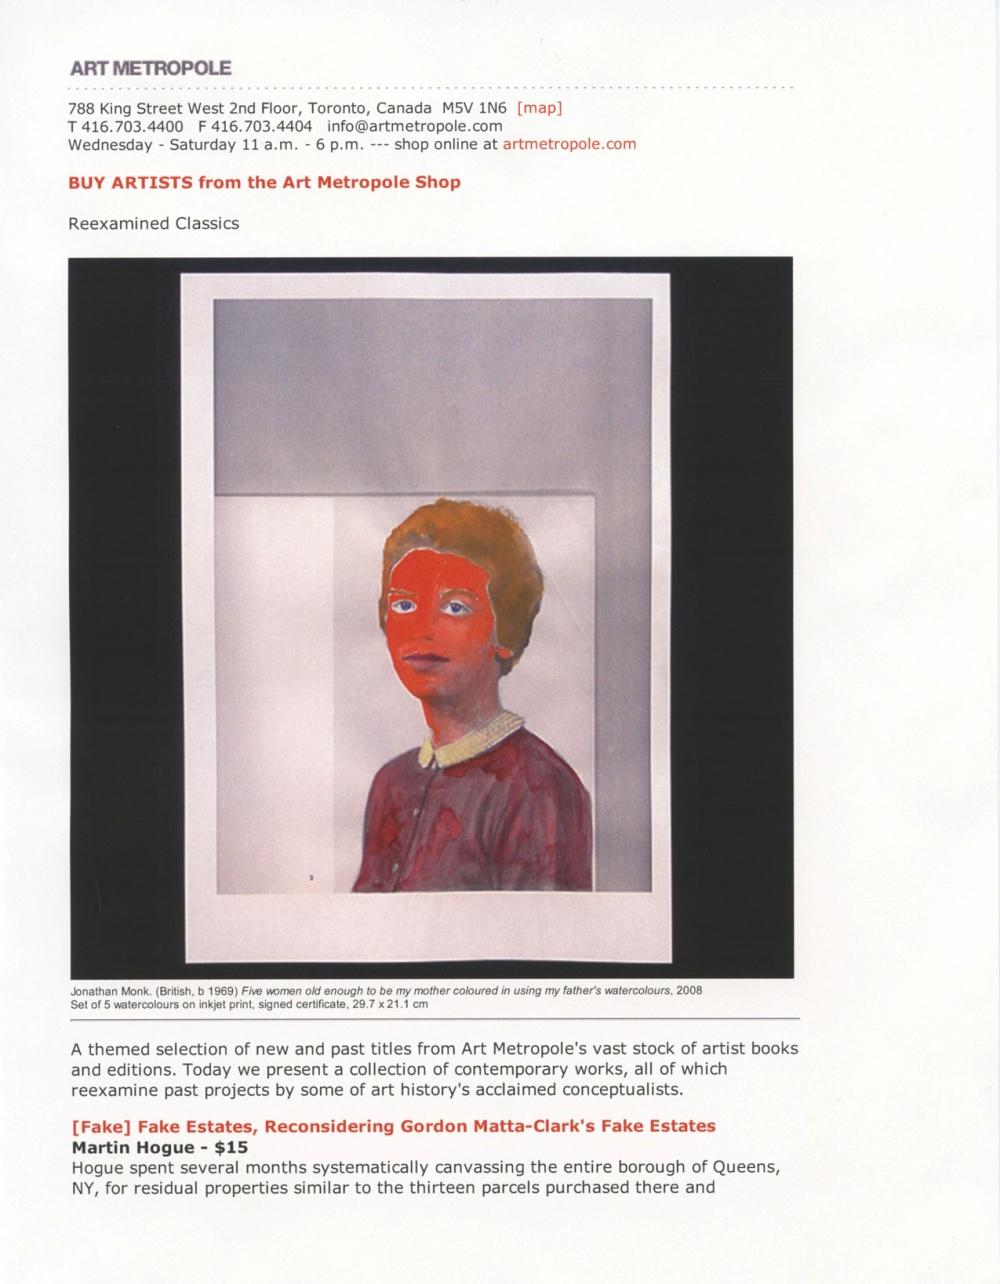 AMA0904, page 1